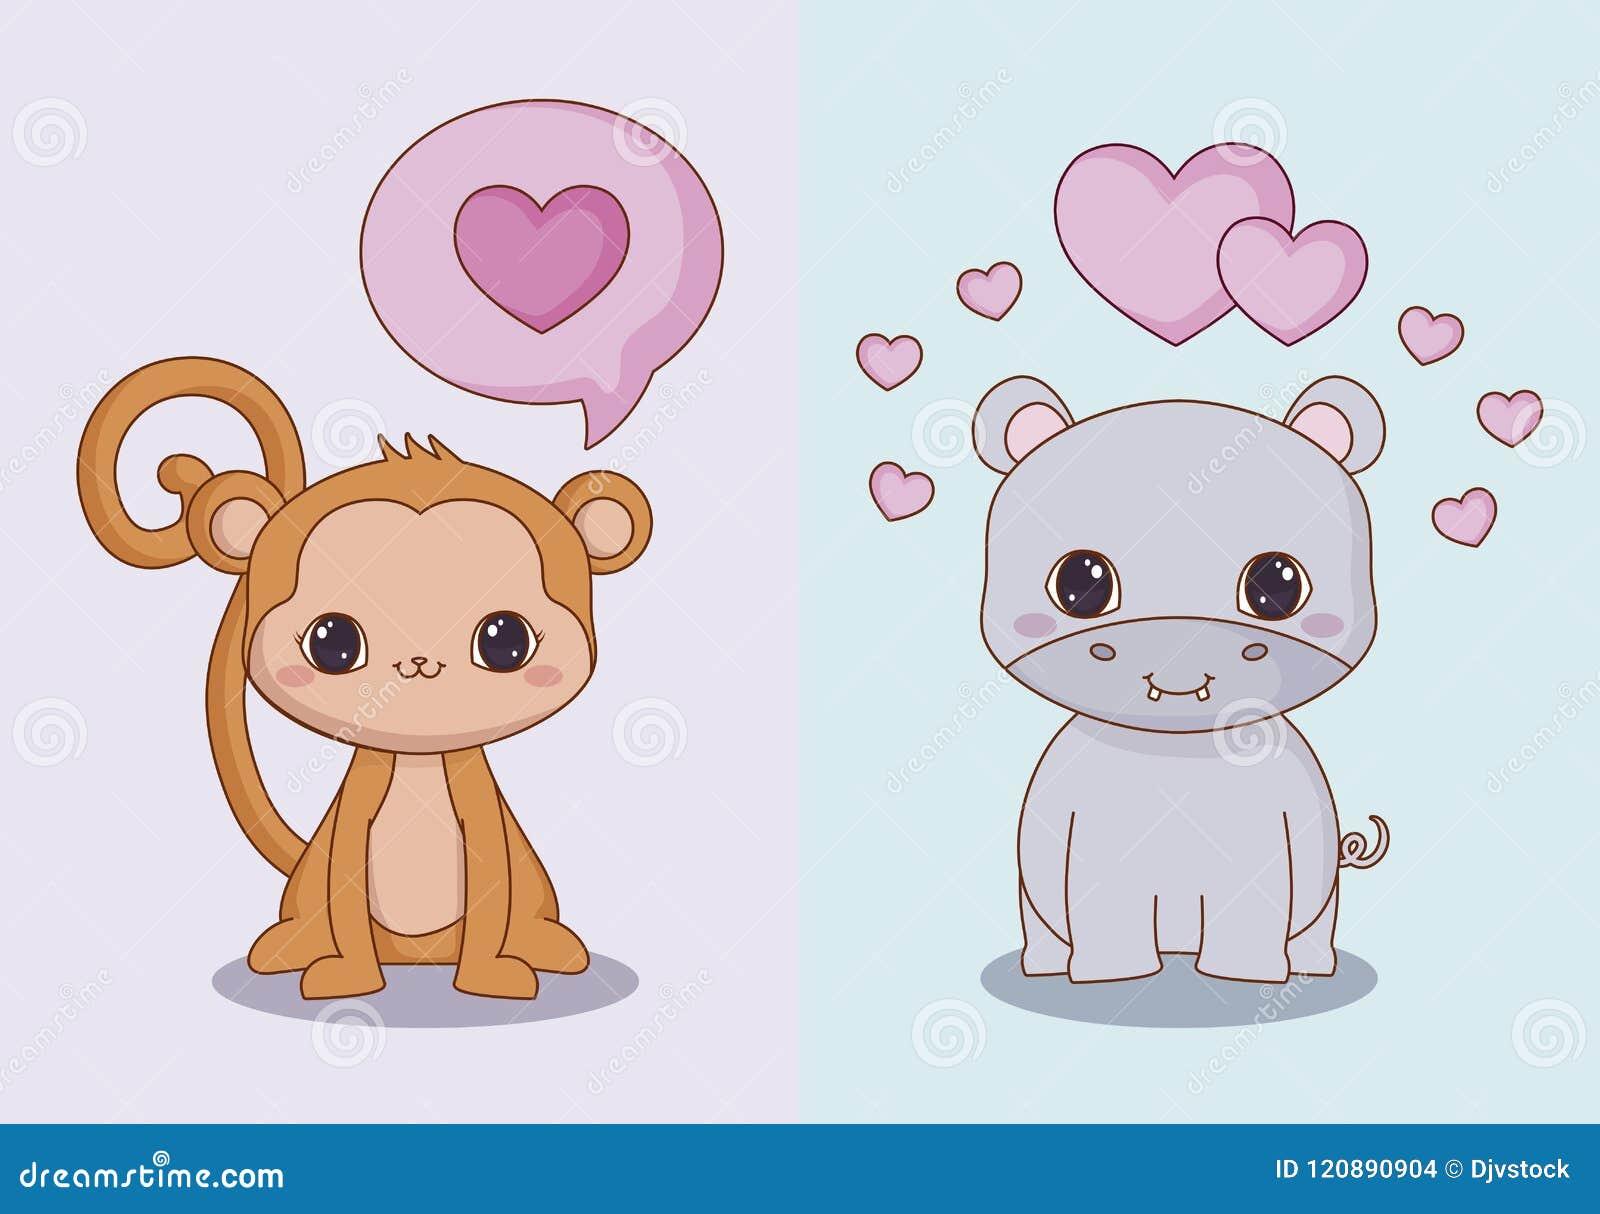 Kawaii Animals And Love Design Stock Vector - Illustration of